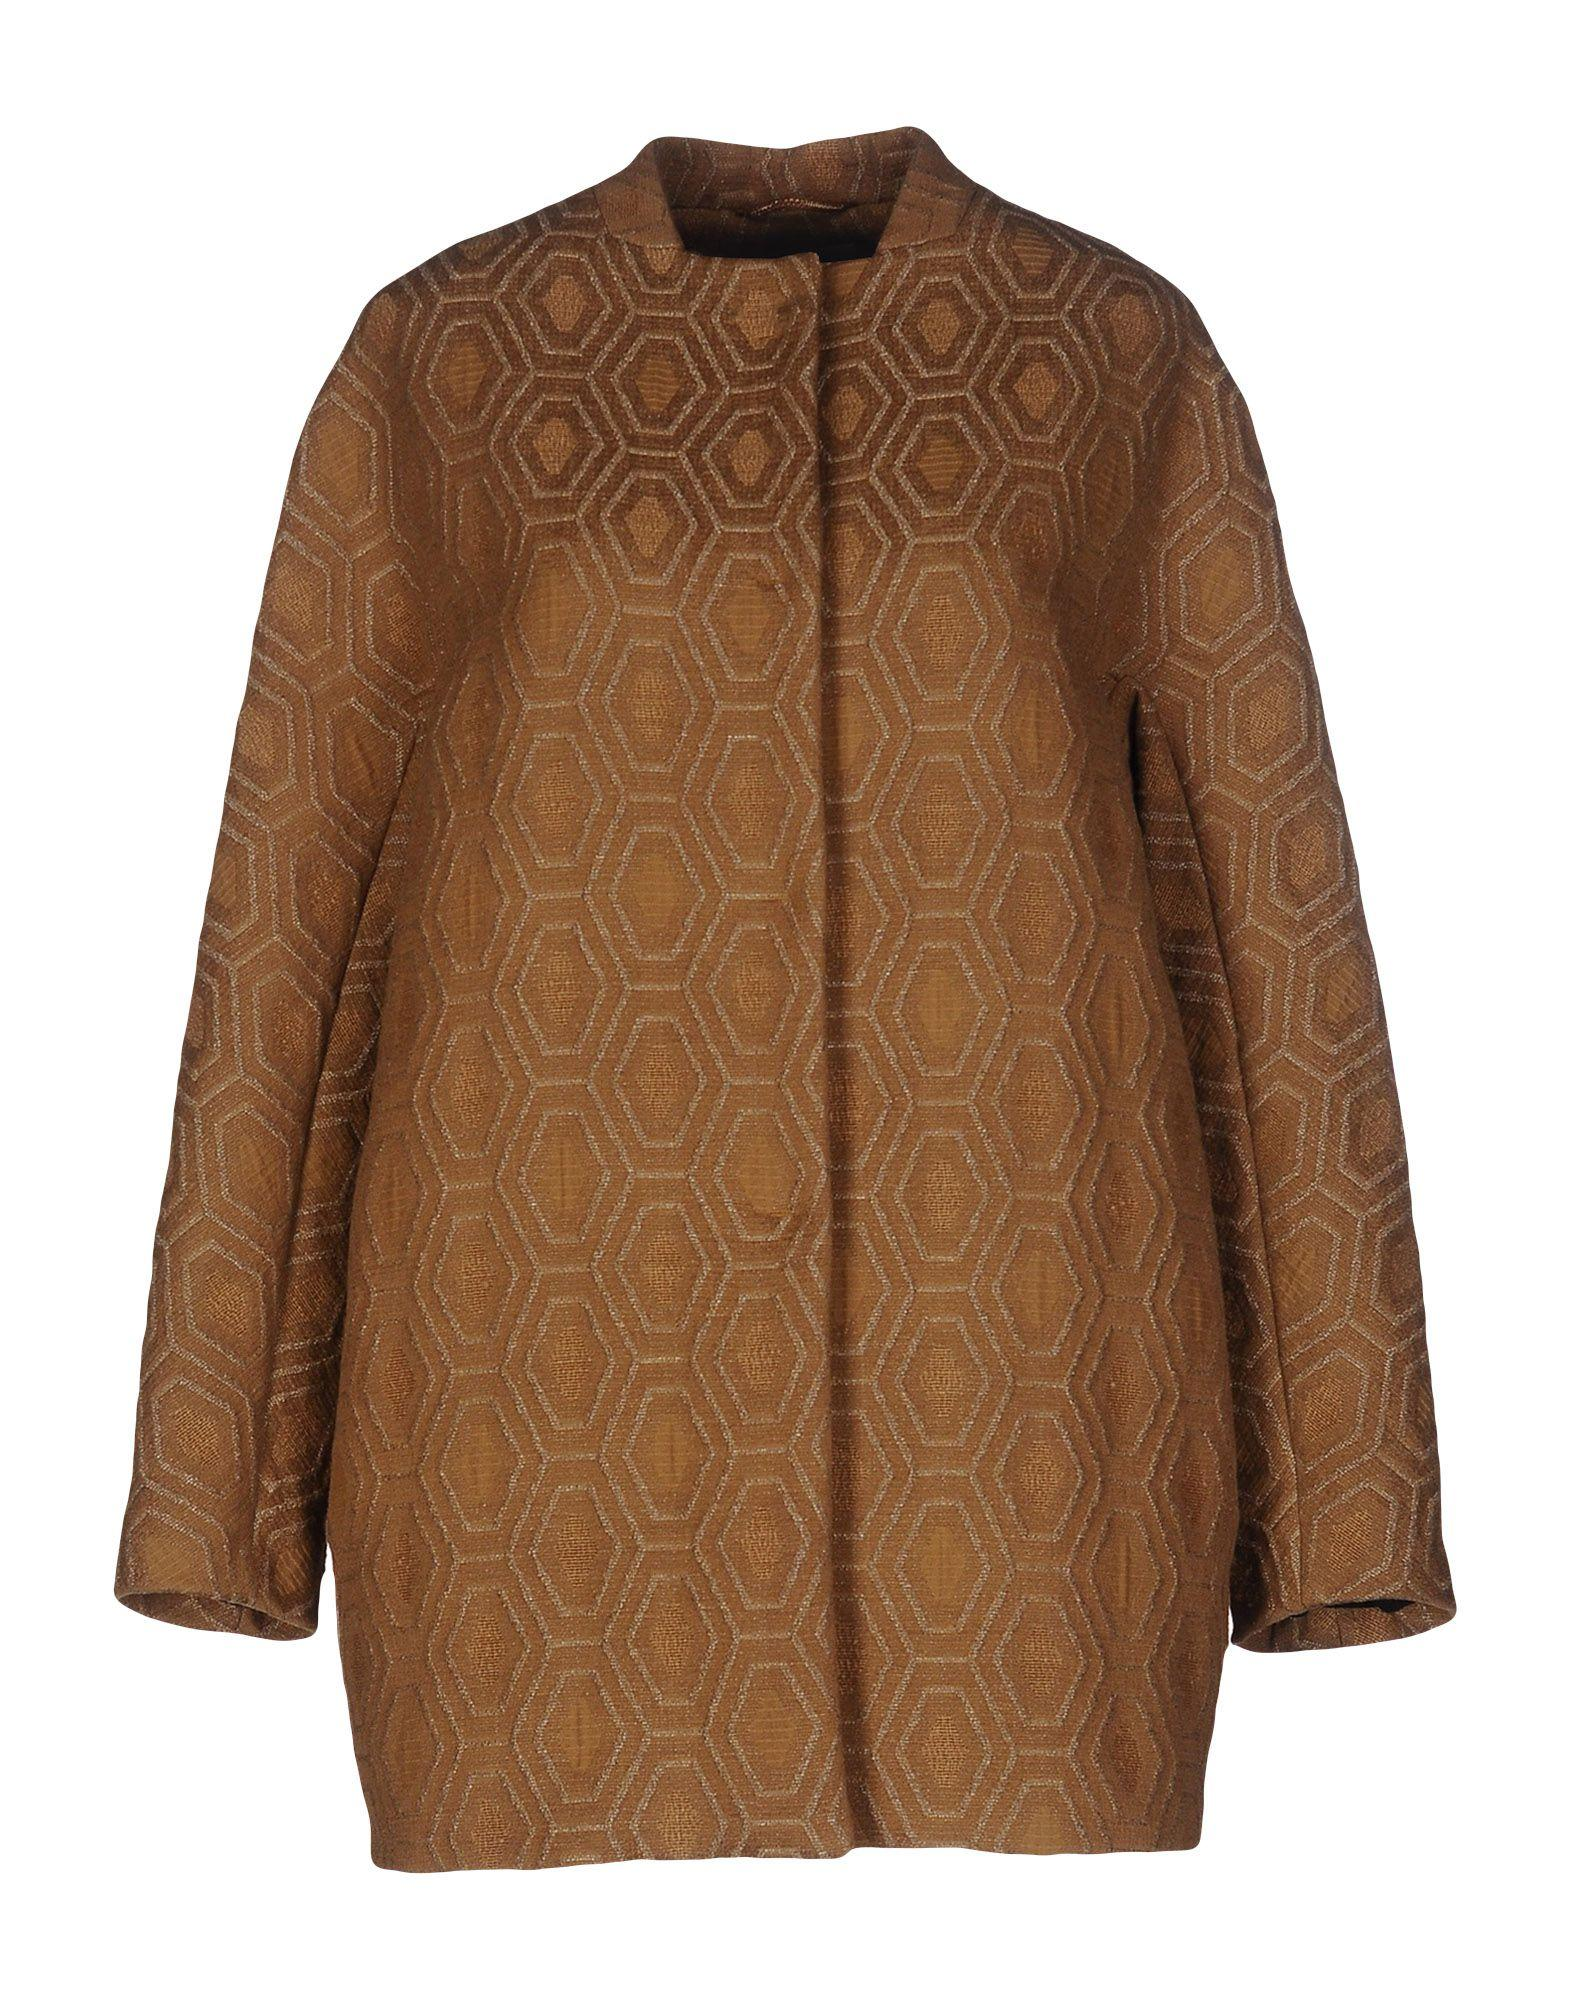 MomonÍ Coat In Camel